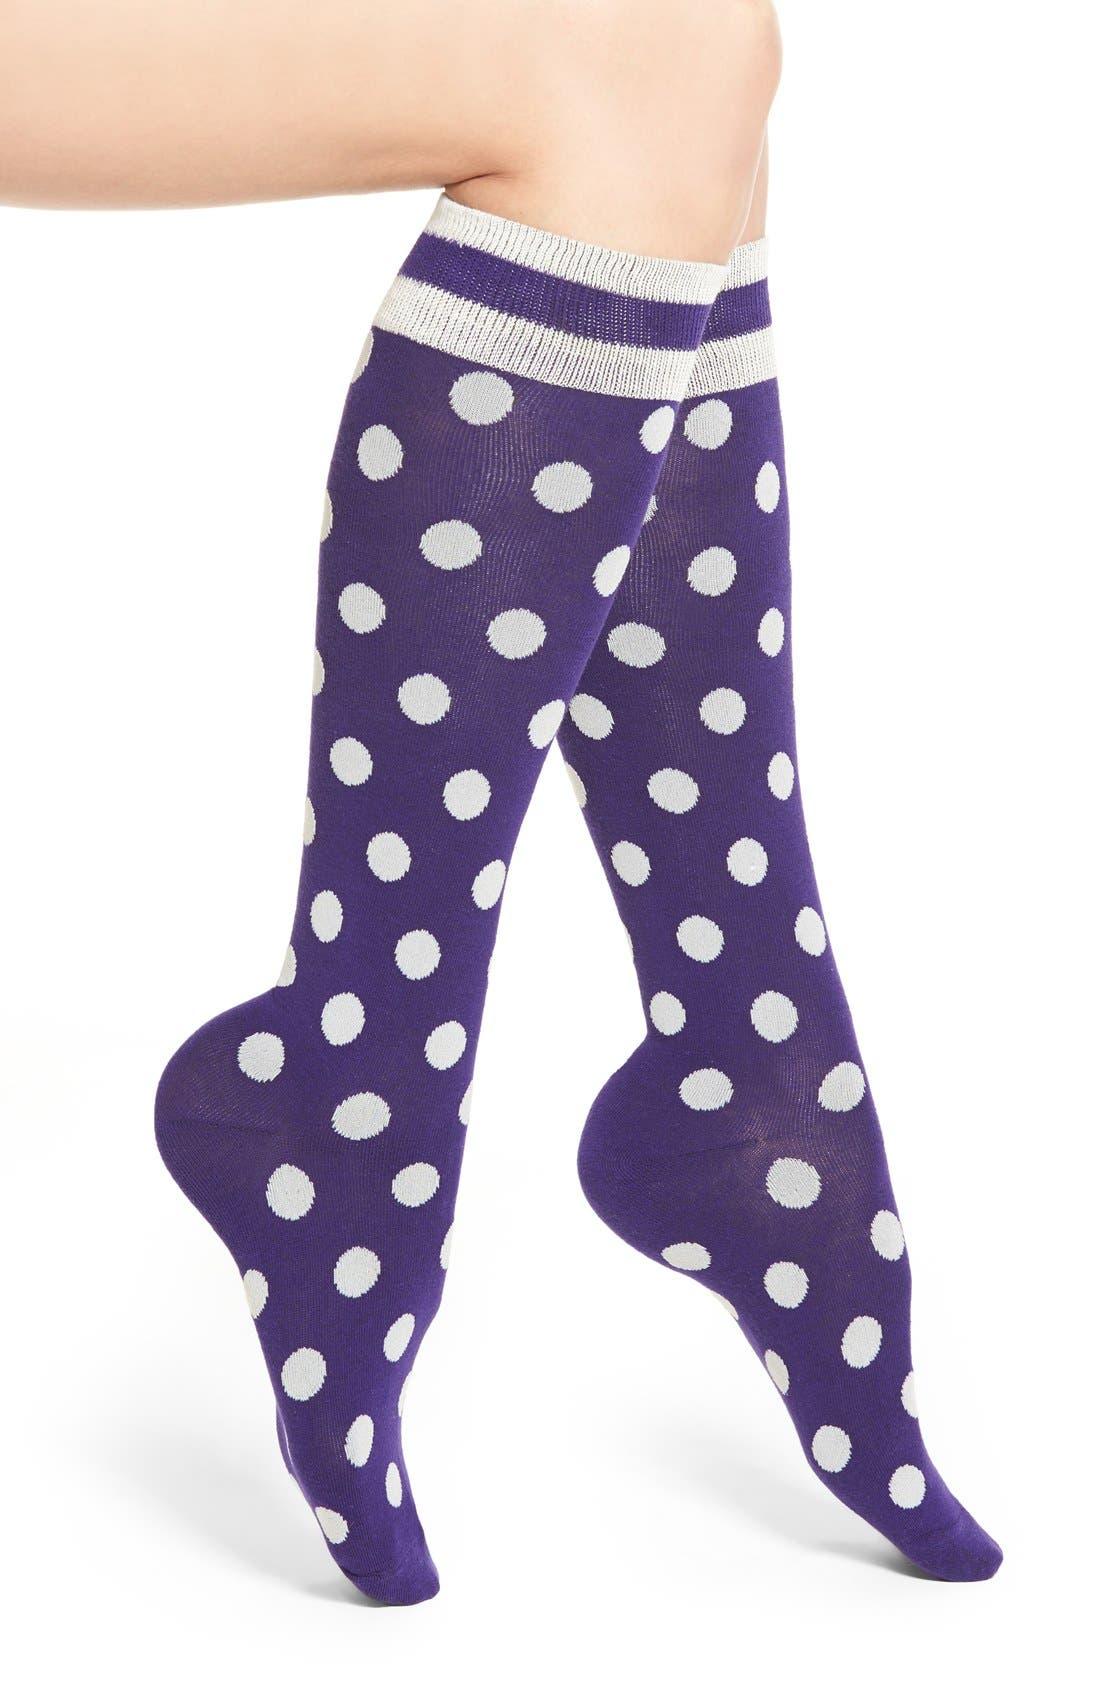 Main Image - kate spade new yoke polka dot knee high socks